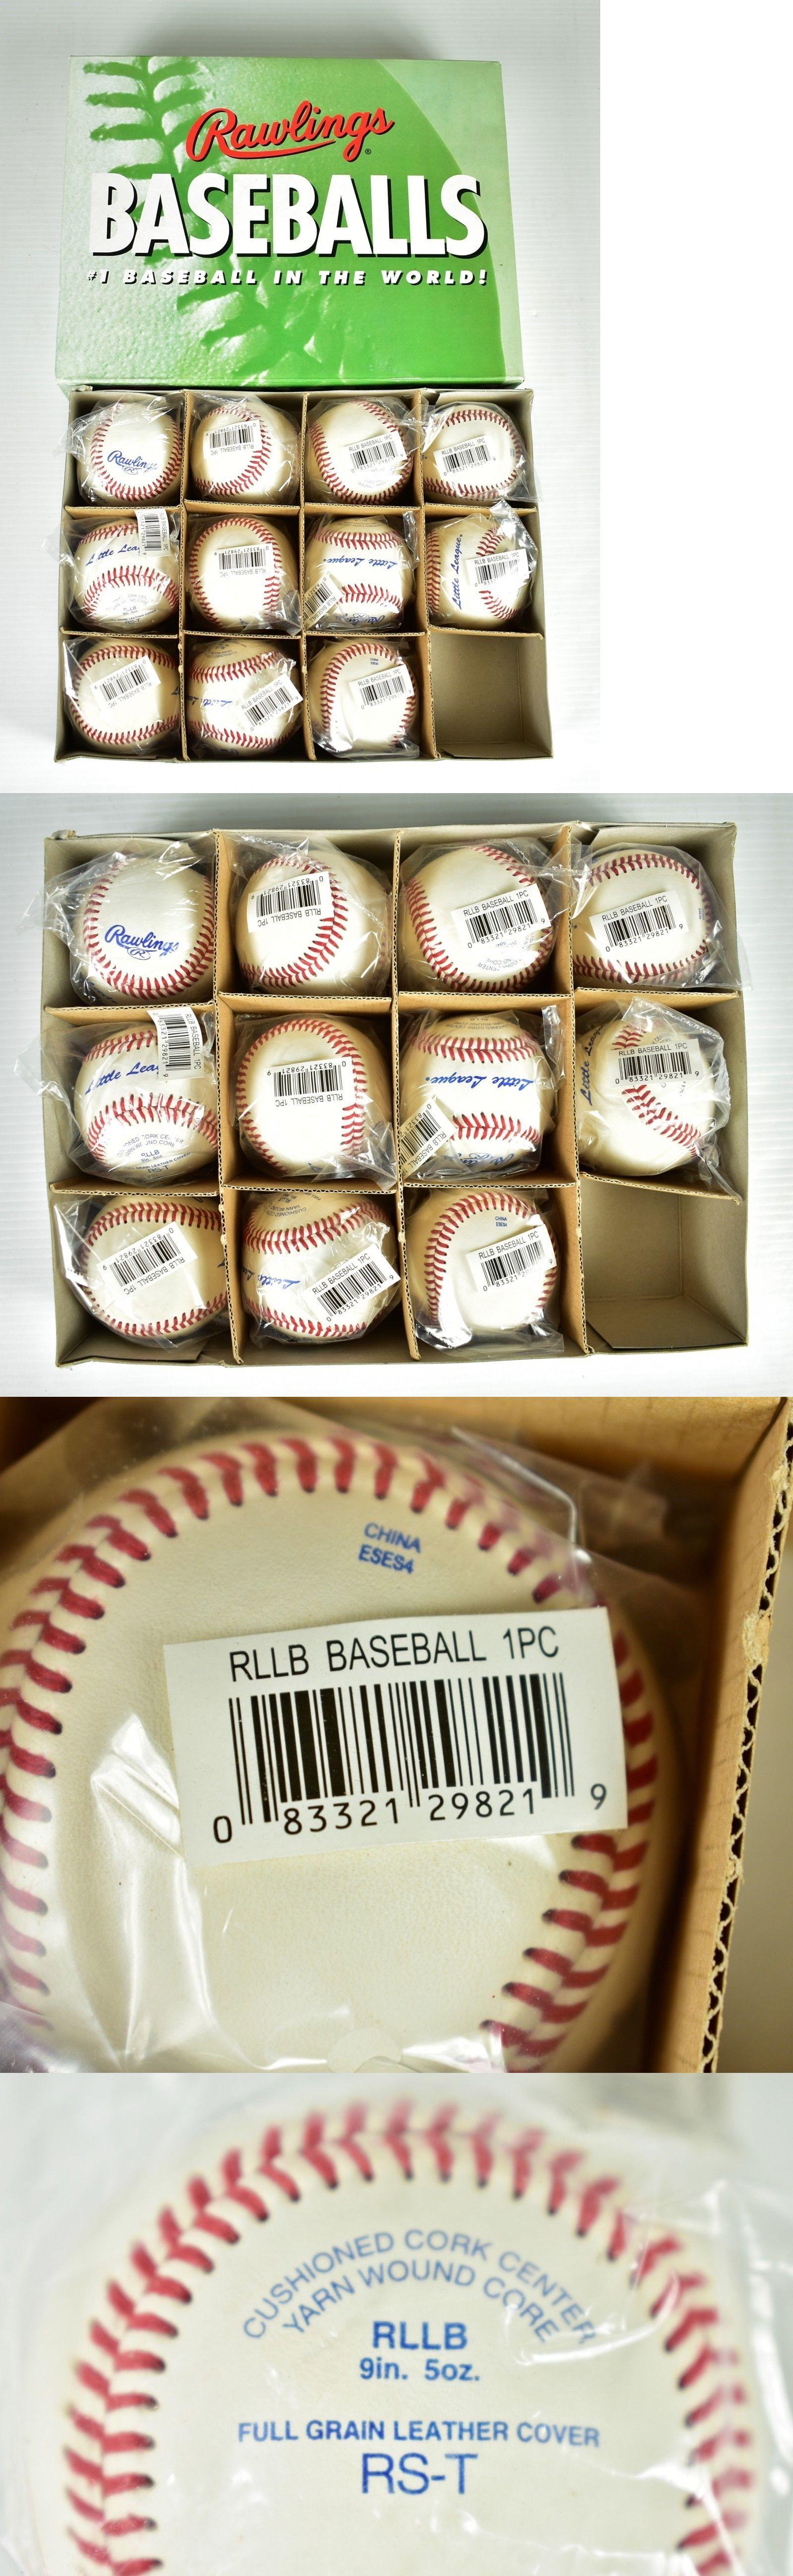 Baseballs 73893: Brand New Rawlings Rllb (Little League